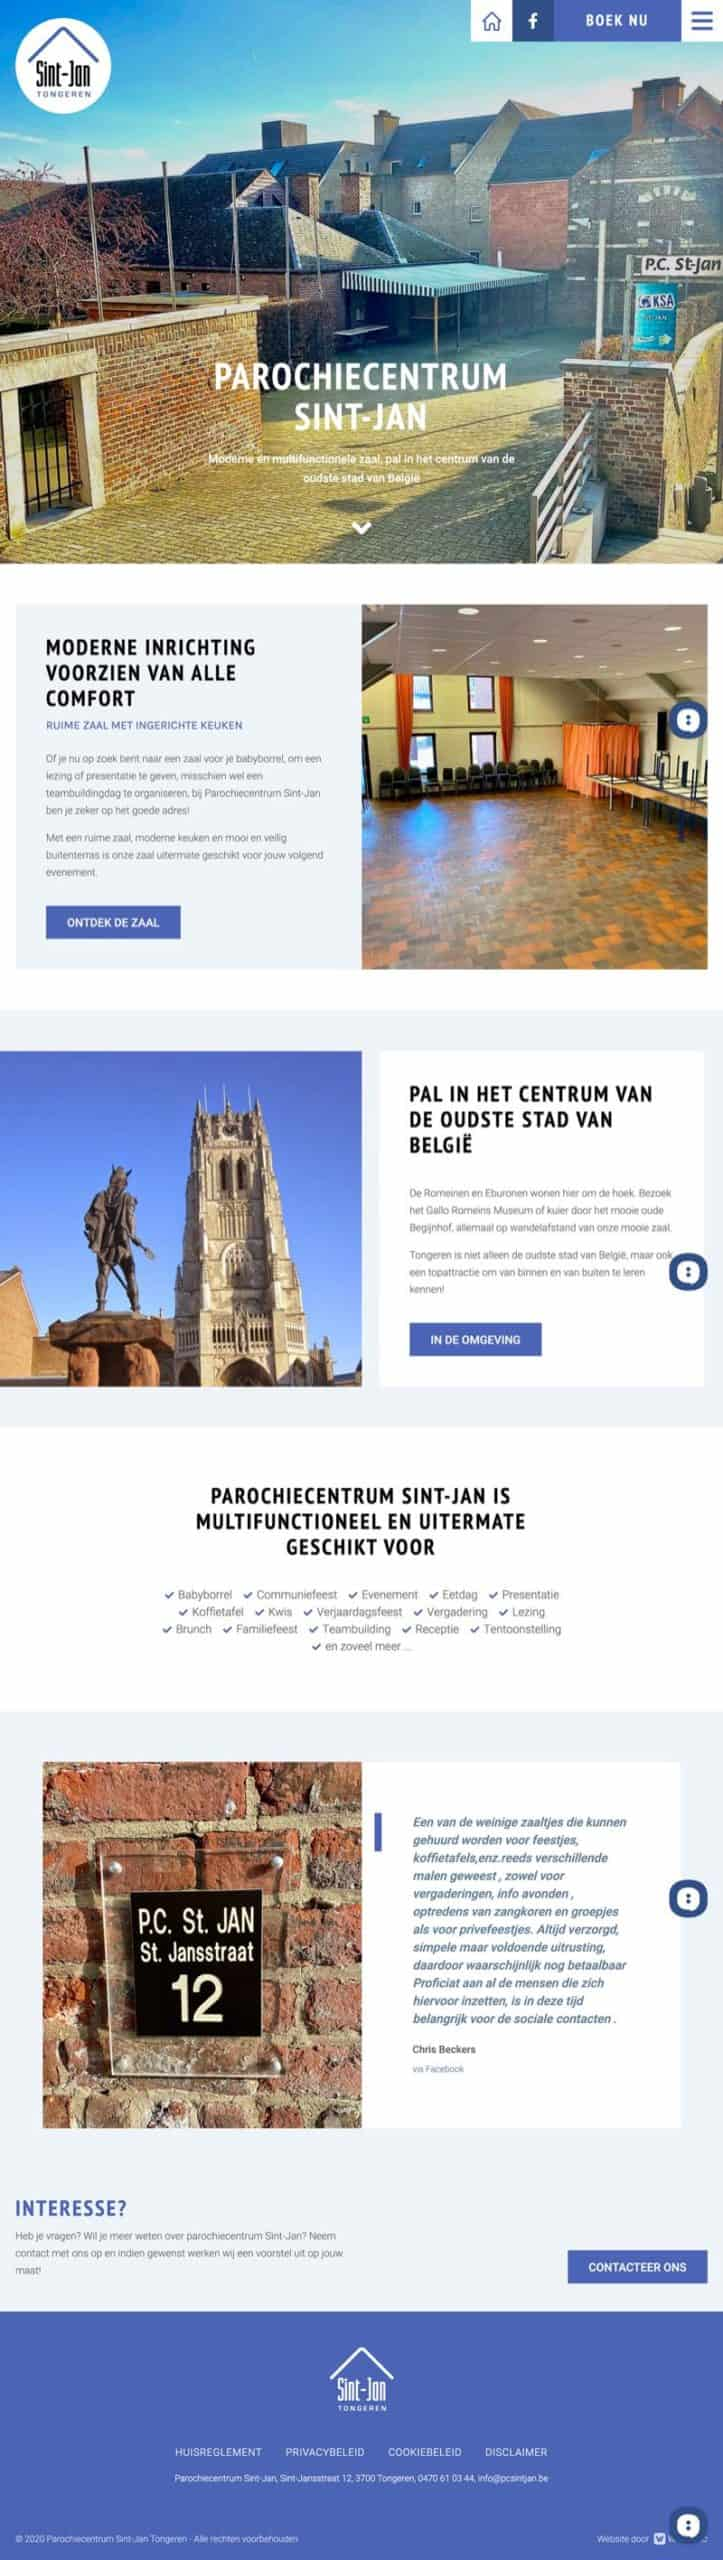 webmatic-portfolio-parochiecentrum-sint-jan-tongeren-13818-800